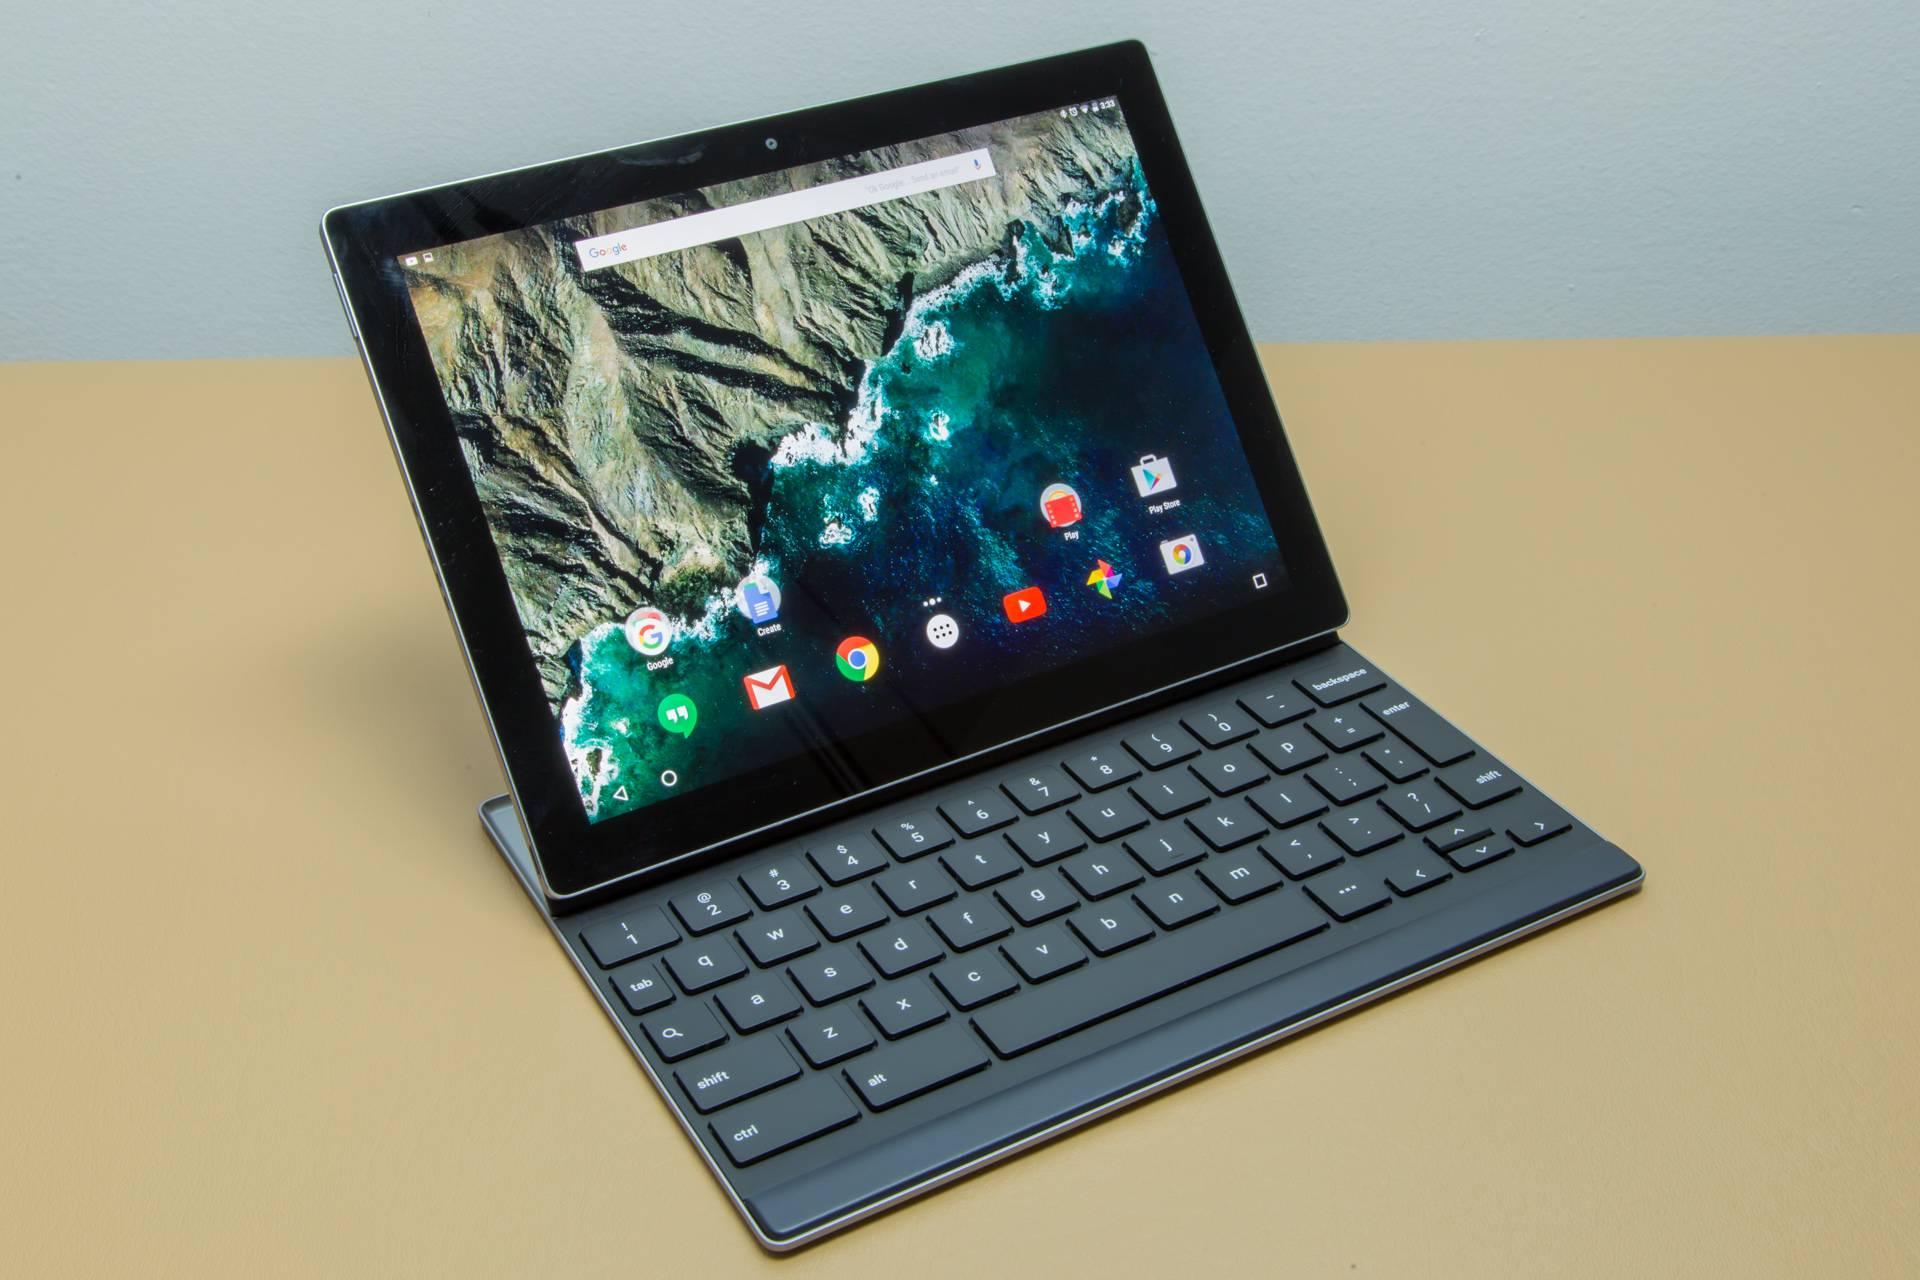 Pixel C Android 2